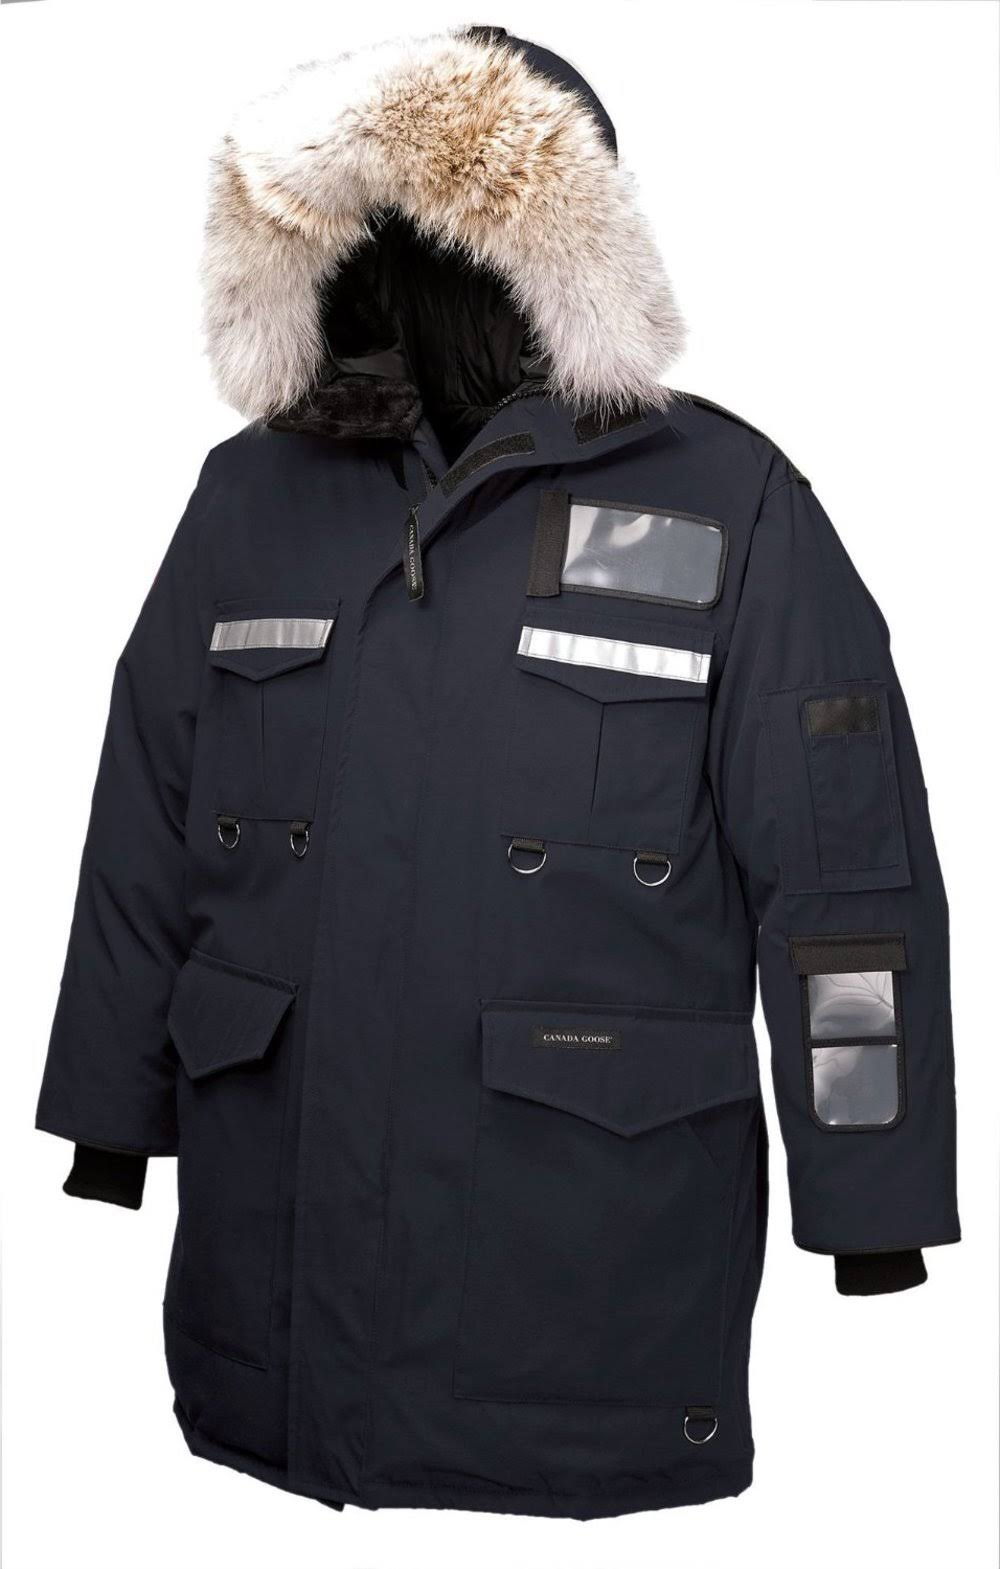 Marino Marino Resolute Parka Canada Down Goose Azul RqZC1